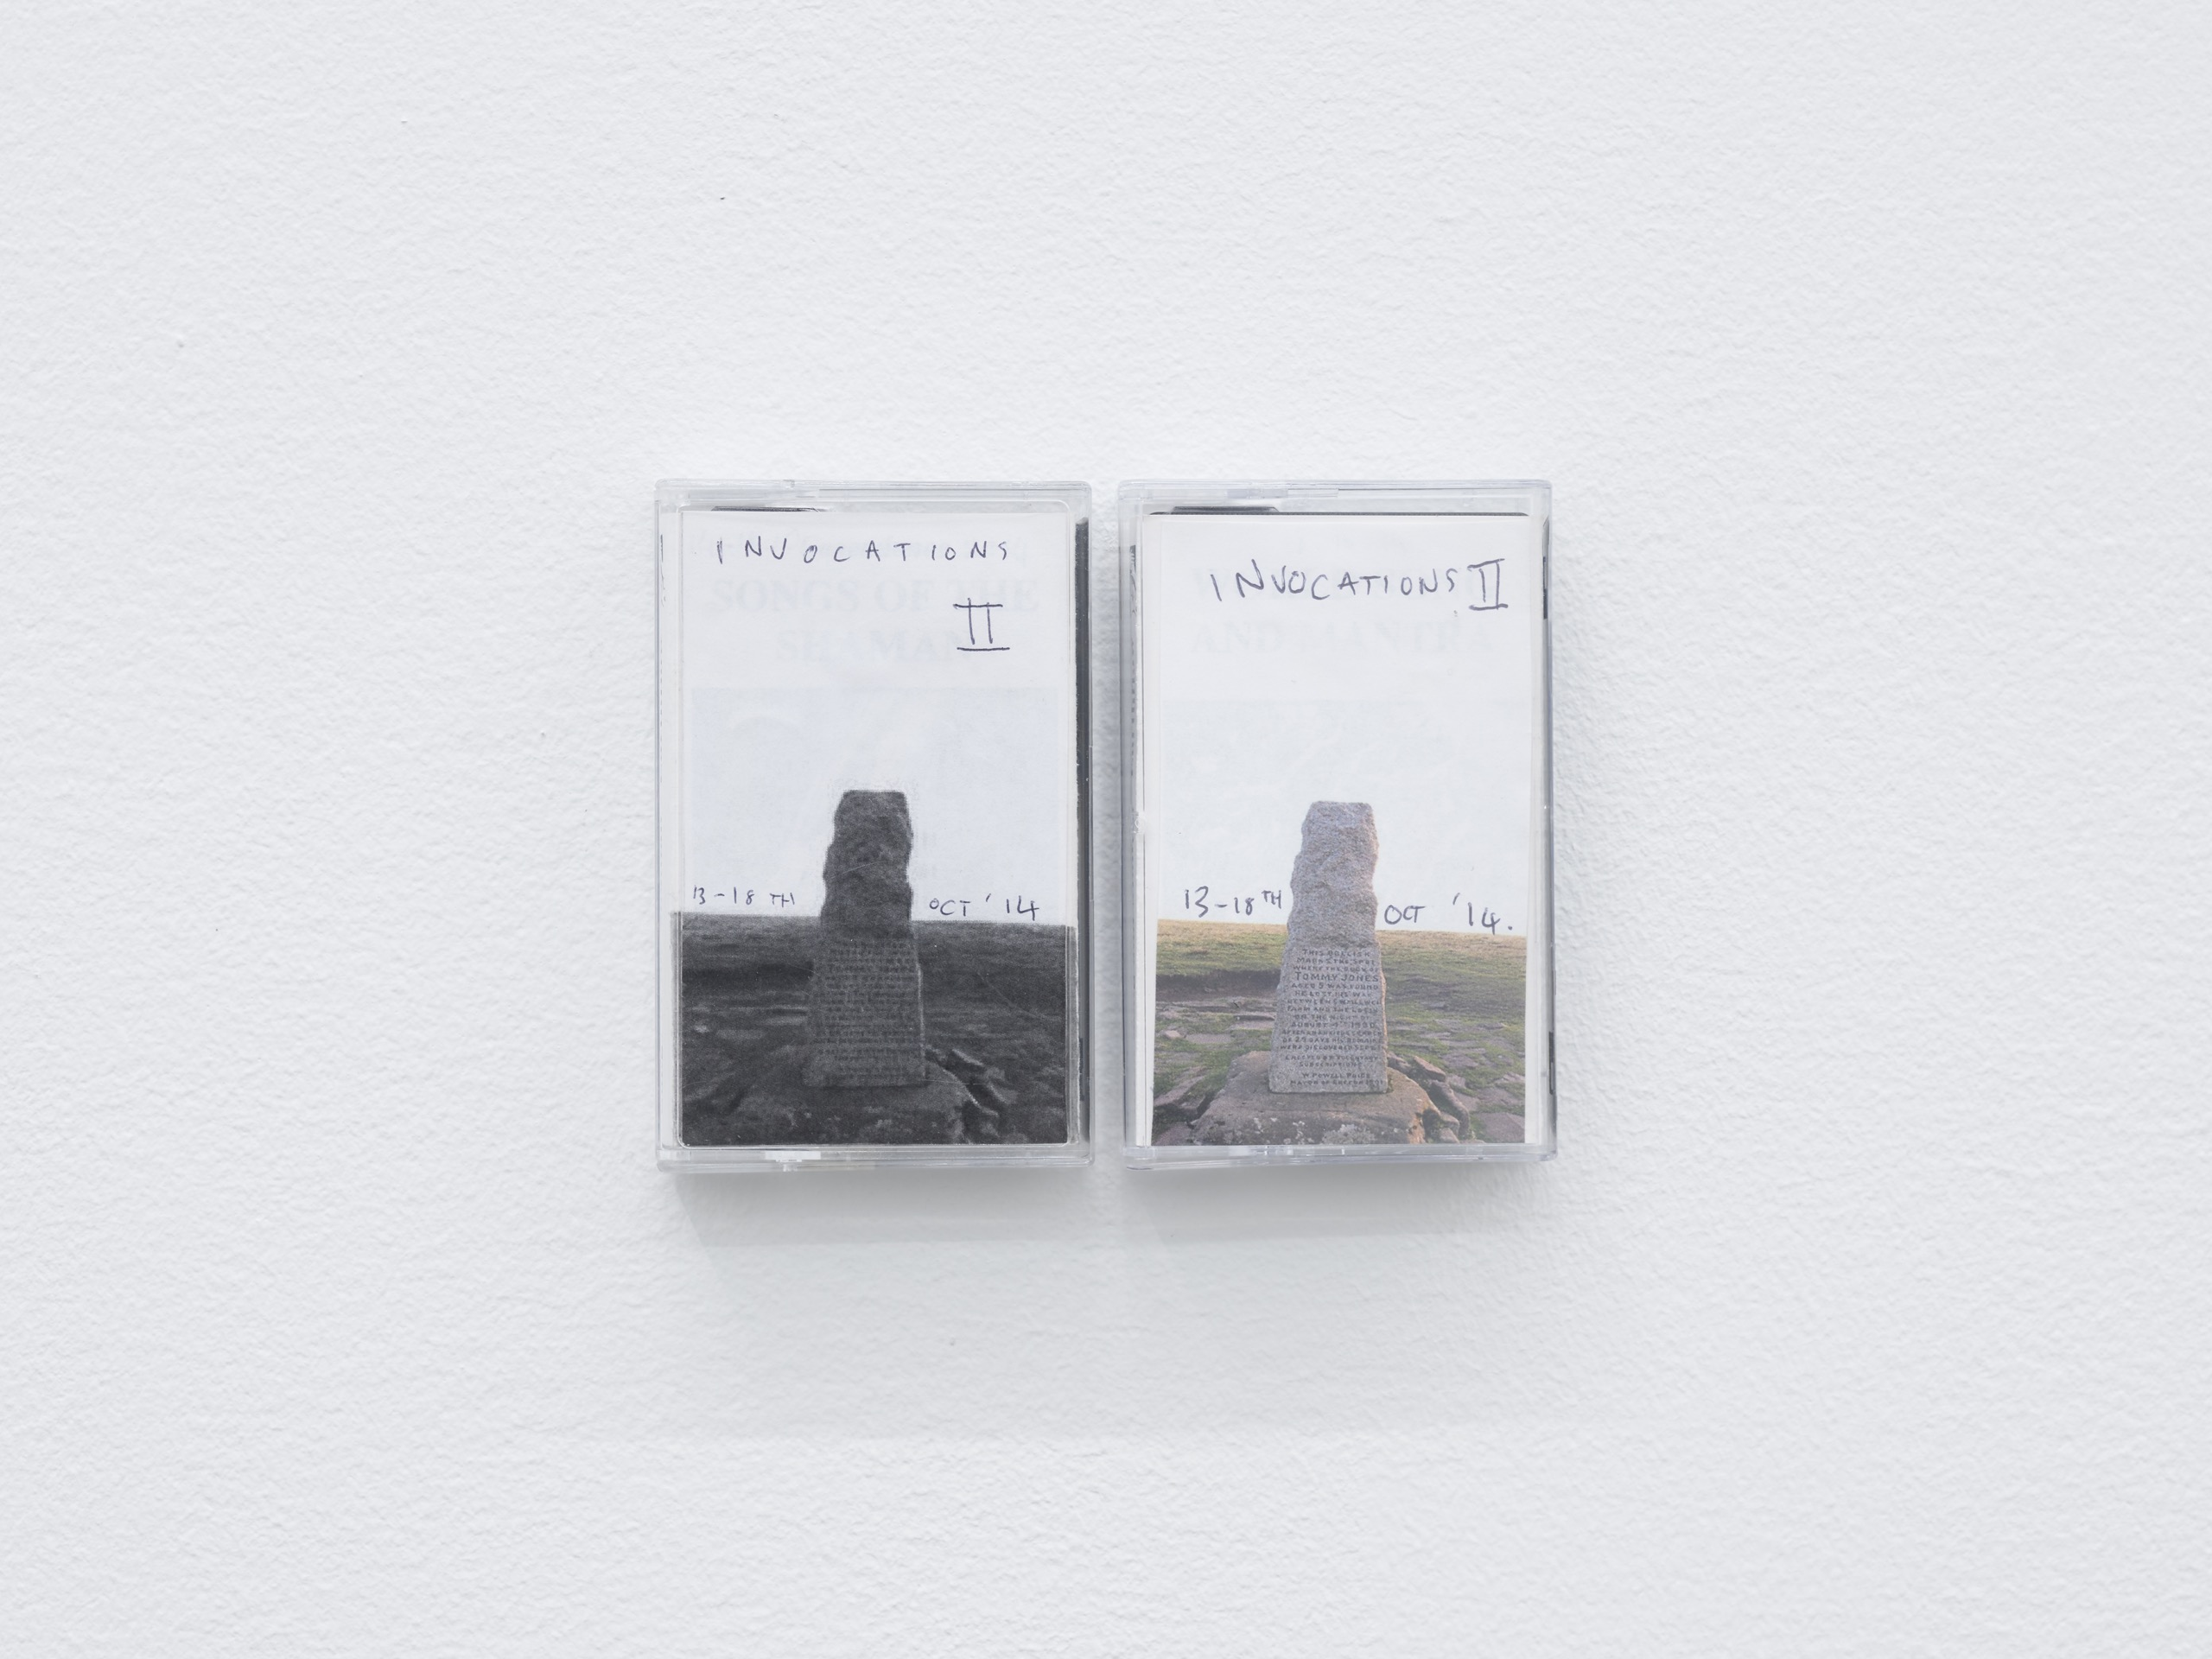 John T. Gast, Invocations II , 2014 Two cassette tapes, mp3 file, website link, 49:59